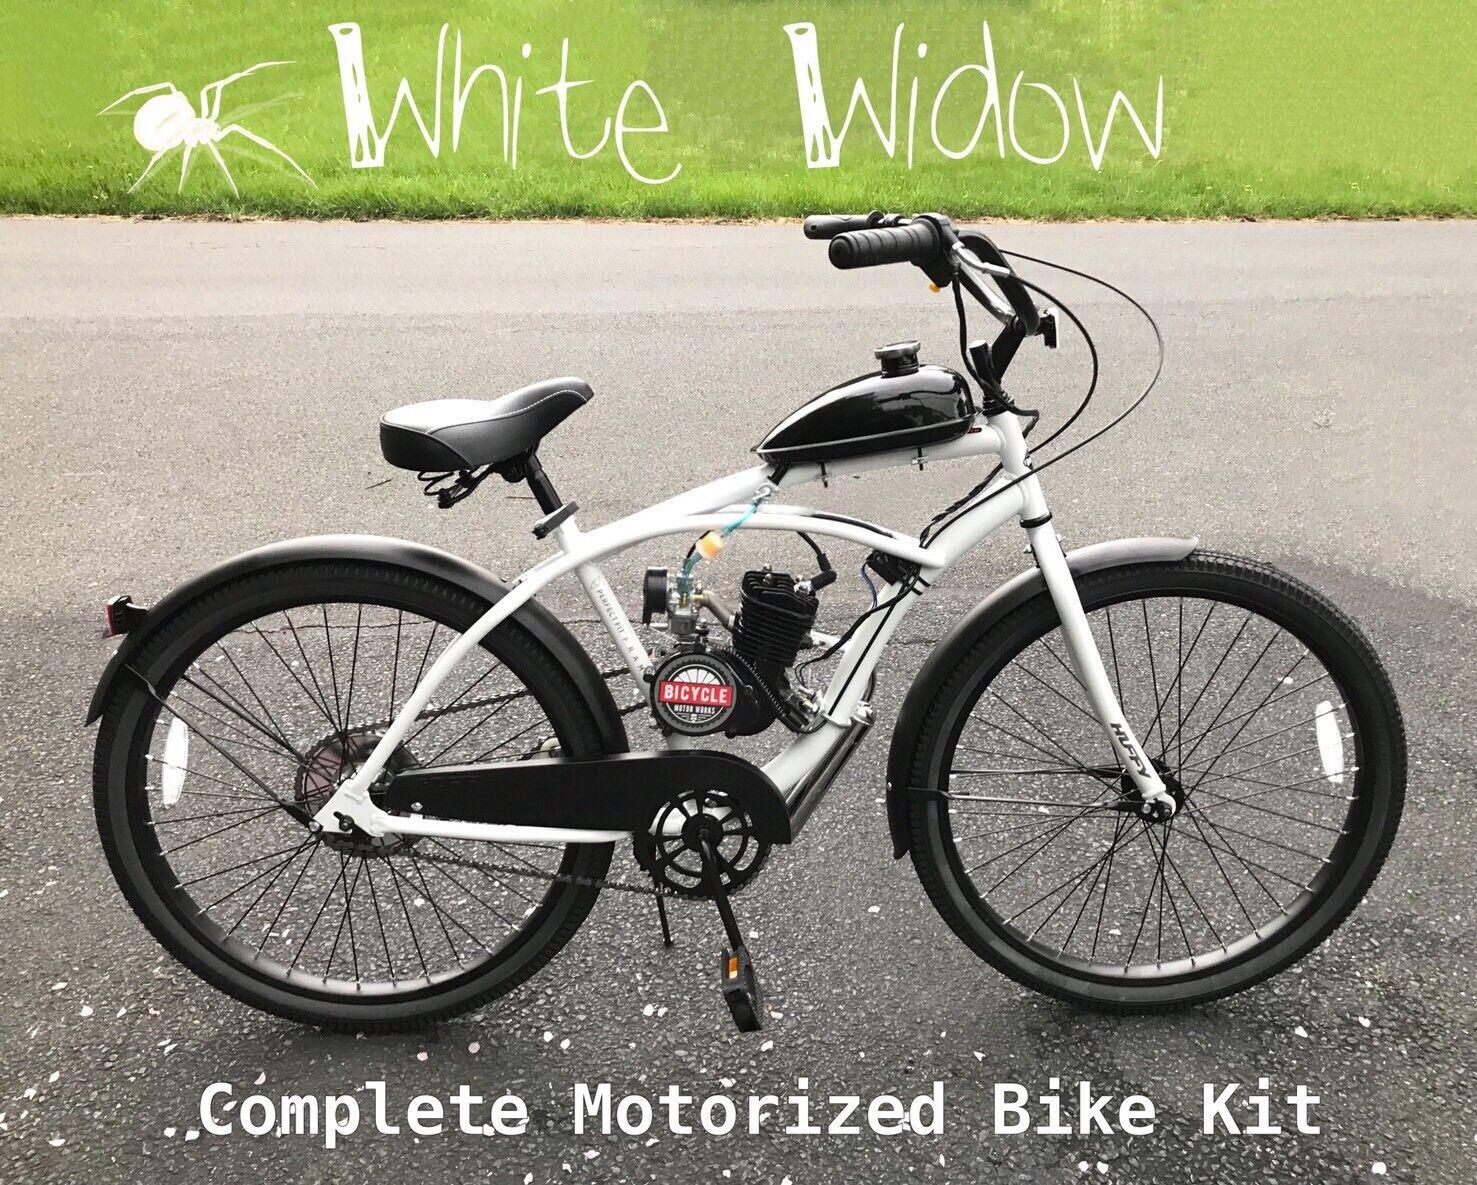 White Widow  - Motorized 66cc Engine & Cruiser Bicycle KIT - Build Yourself